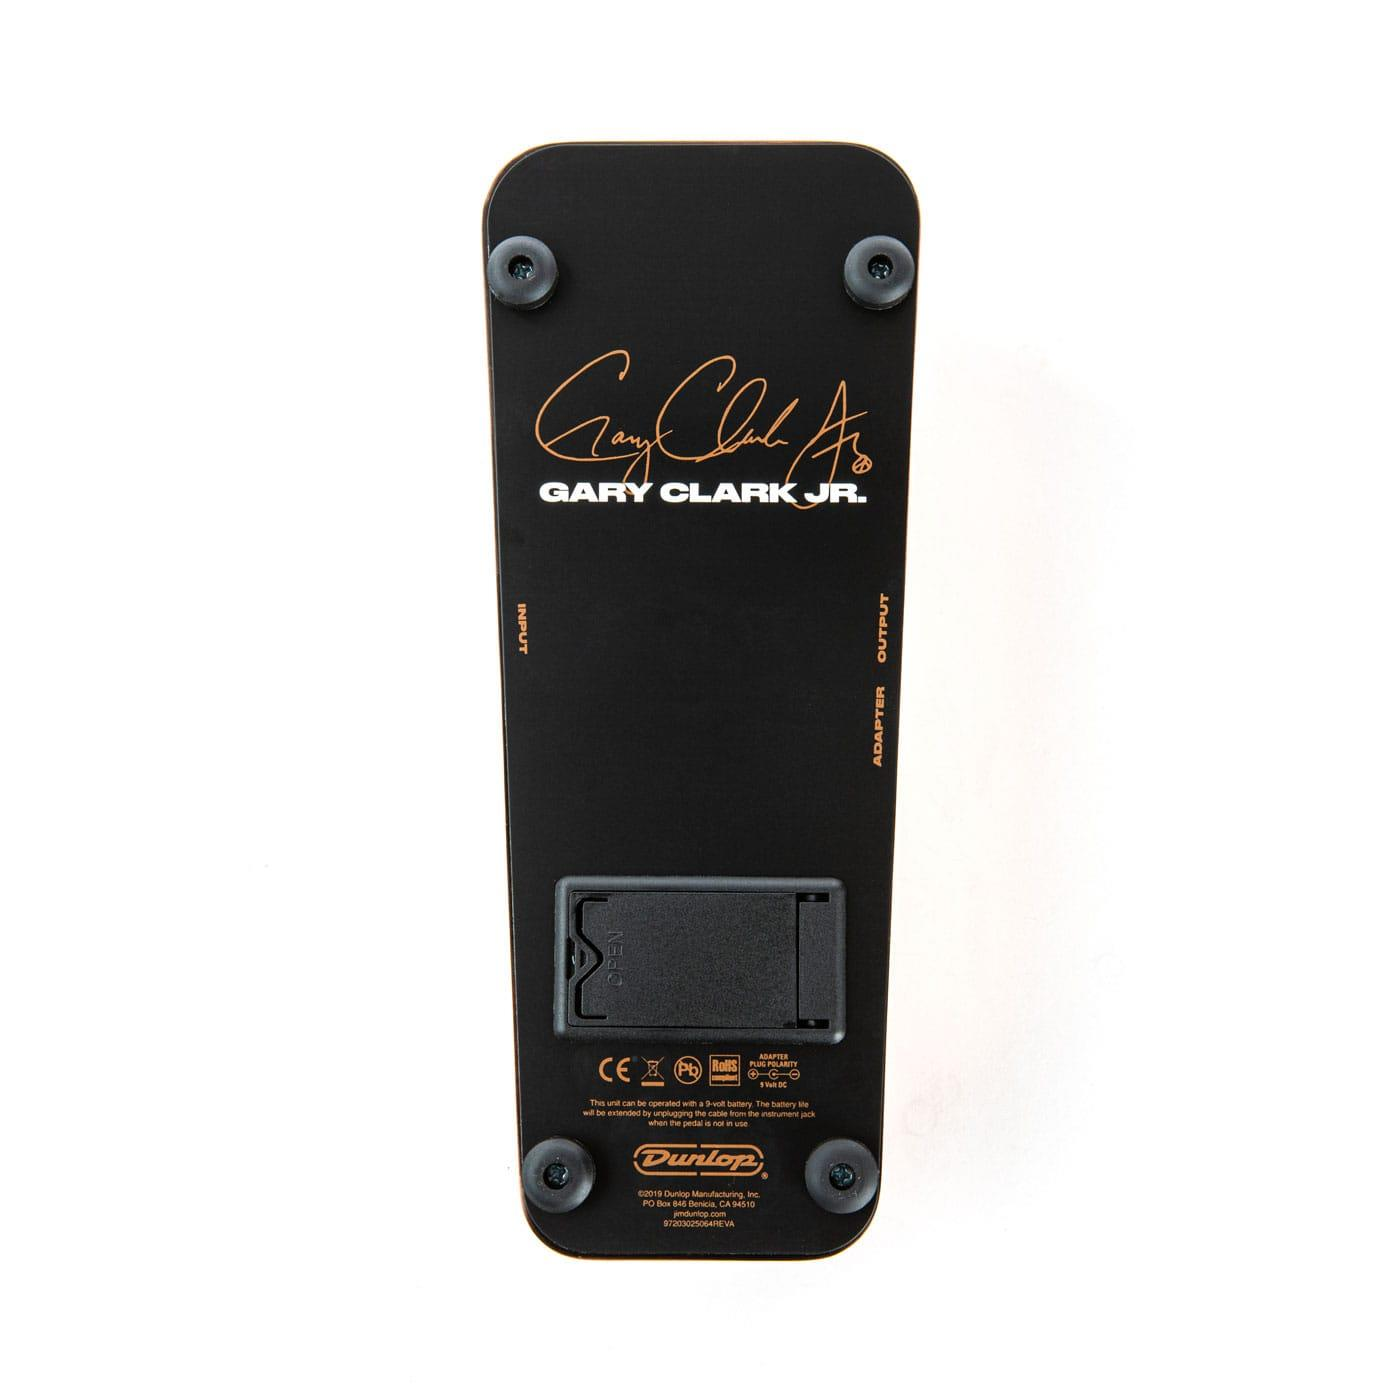 Dunlop GCJ-95 Gary Clark Jr Cry Baby Wah pedal